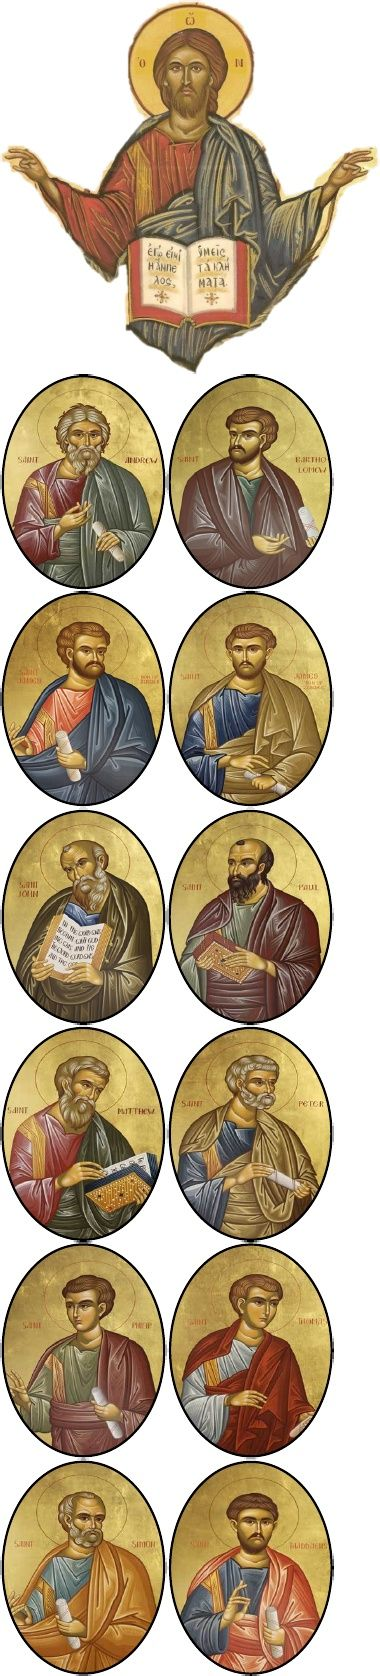 Orthodox Apostles Tree Medallions....толкование БИБЛИИ тут Иоанн 13; 21-26 и далее все ответы ИЛИ http://otveti.org/tolkovanie-biblii/evangelie-ioanna/13/